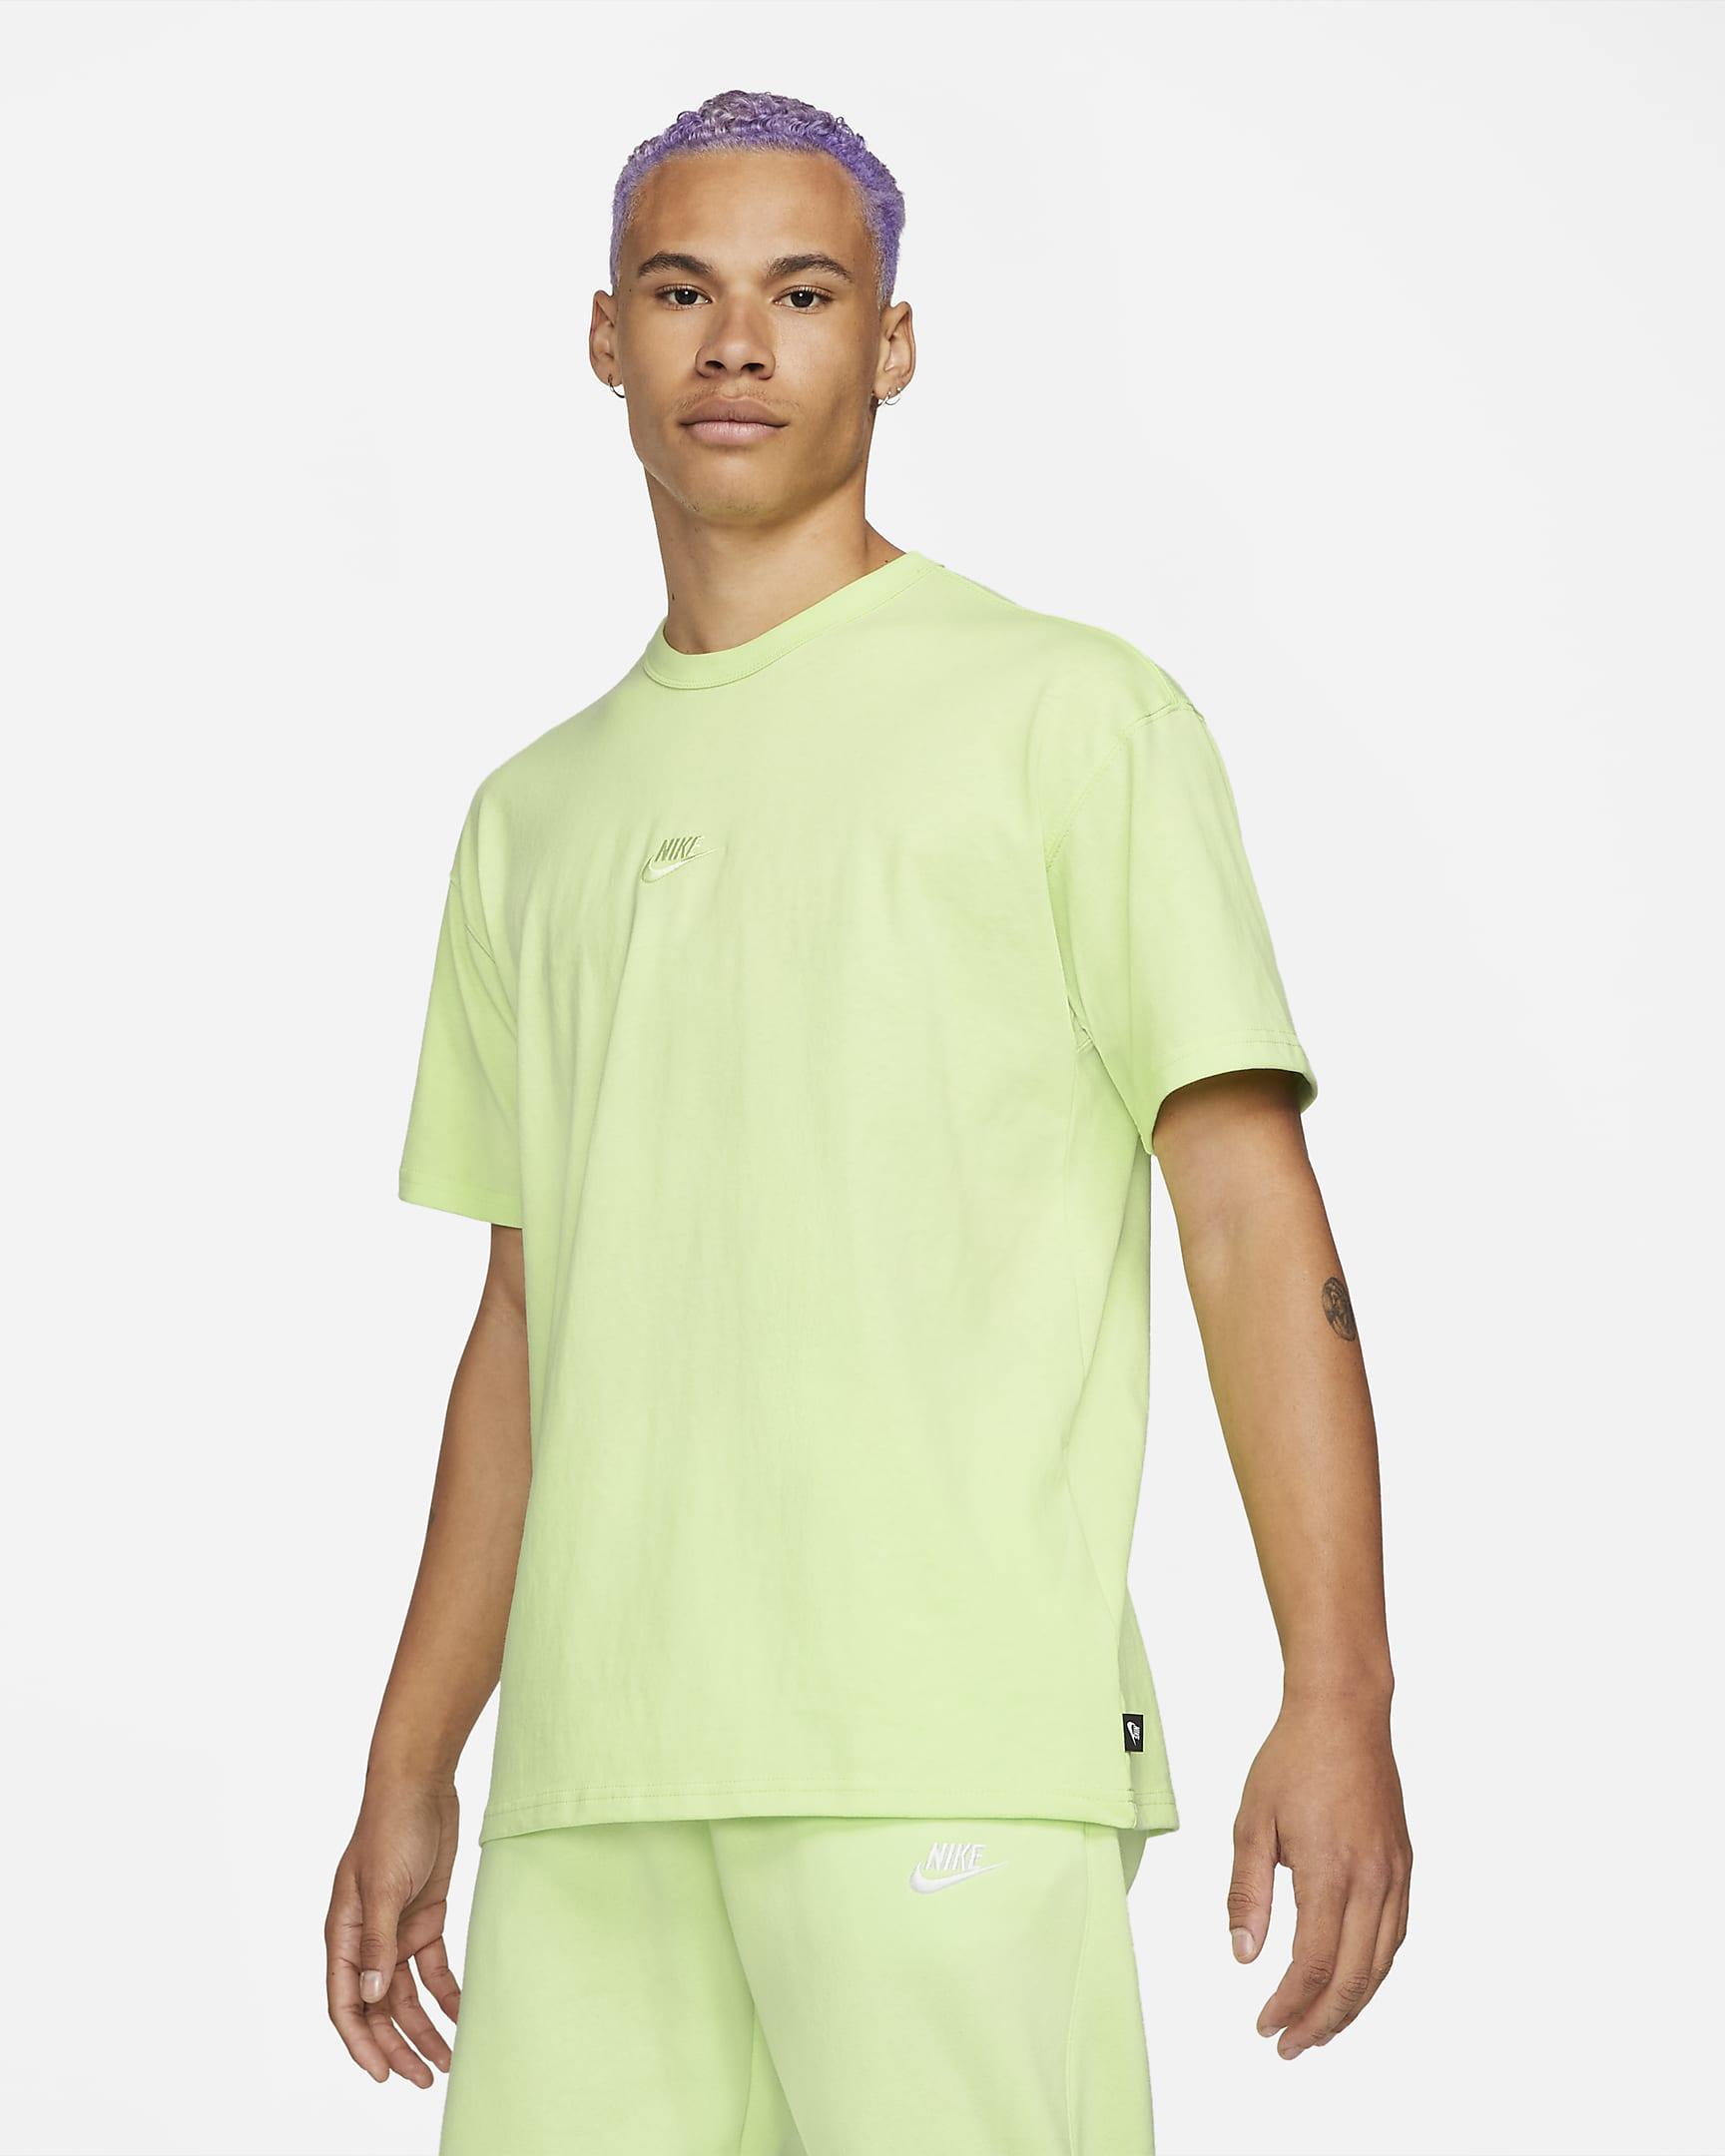 nike-sportswear-premium-essential-mens-t-shirt-SS1mBB.png